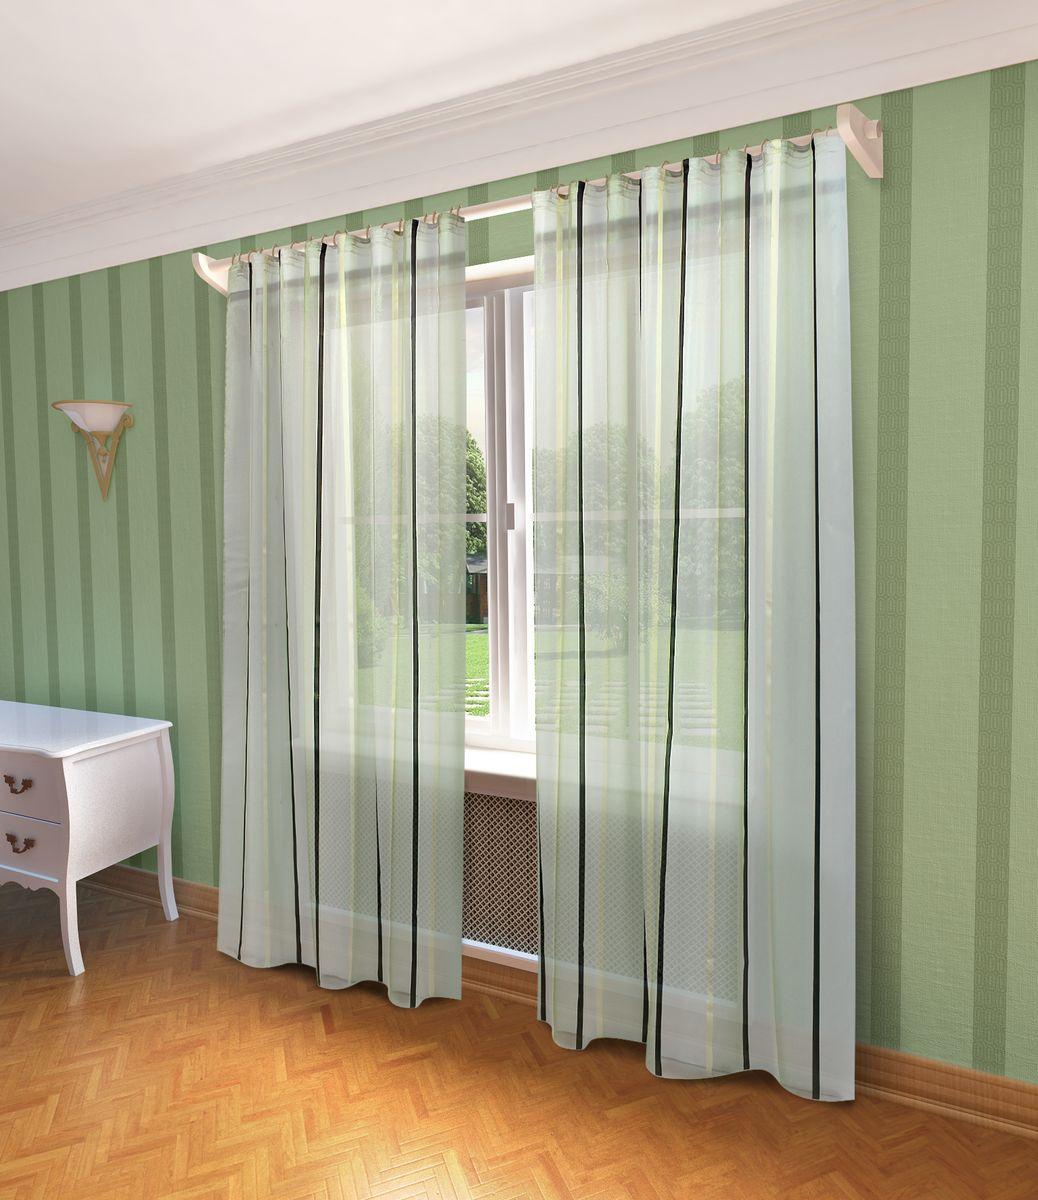 Тюль Sanpa Home Collection Холли, на ленте, цвет: зеленый, высота 280 смHP10462/5/1E Холли зеленый, , 300*280 см